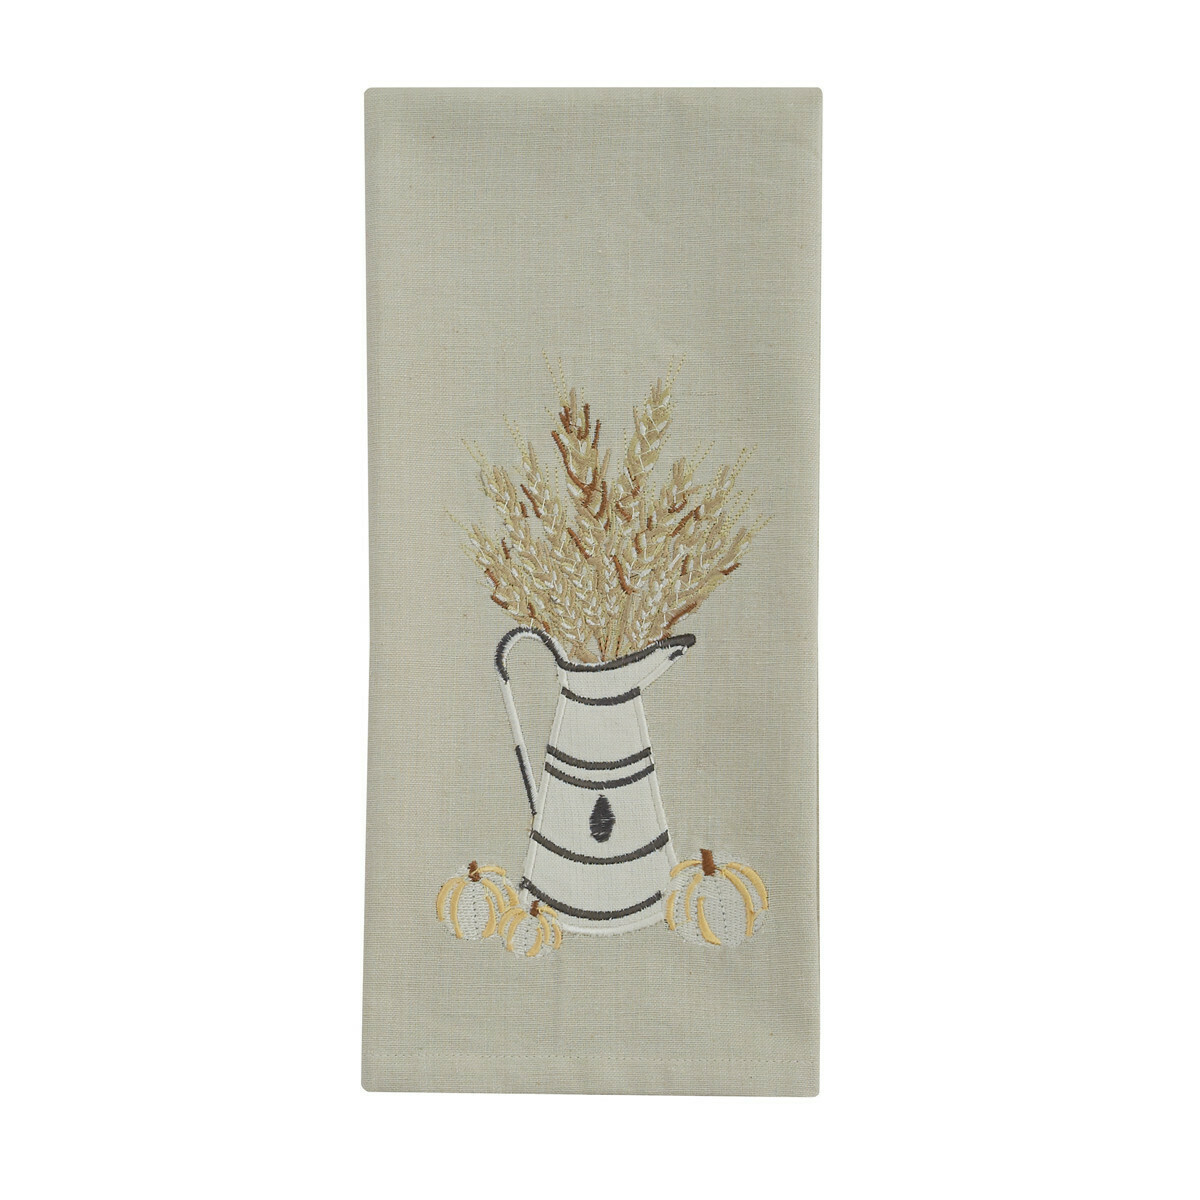 White and Wheat Decorative Dishtowel